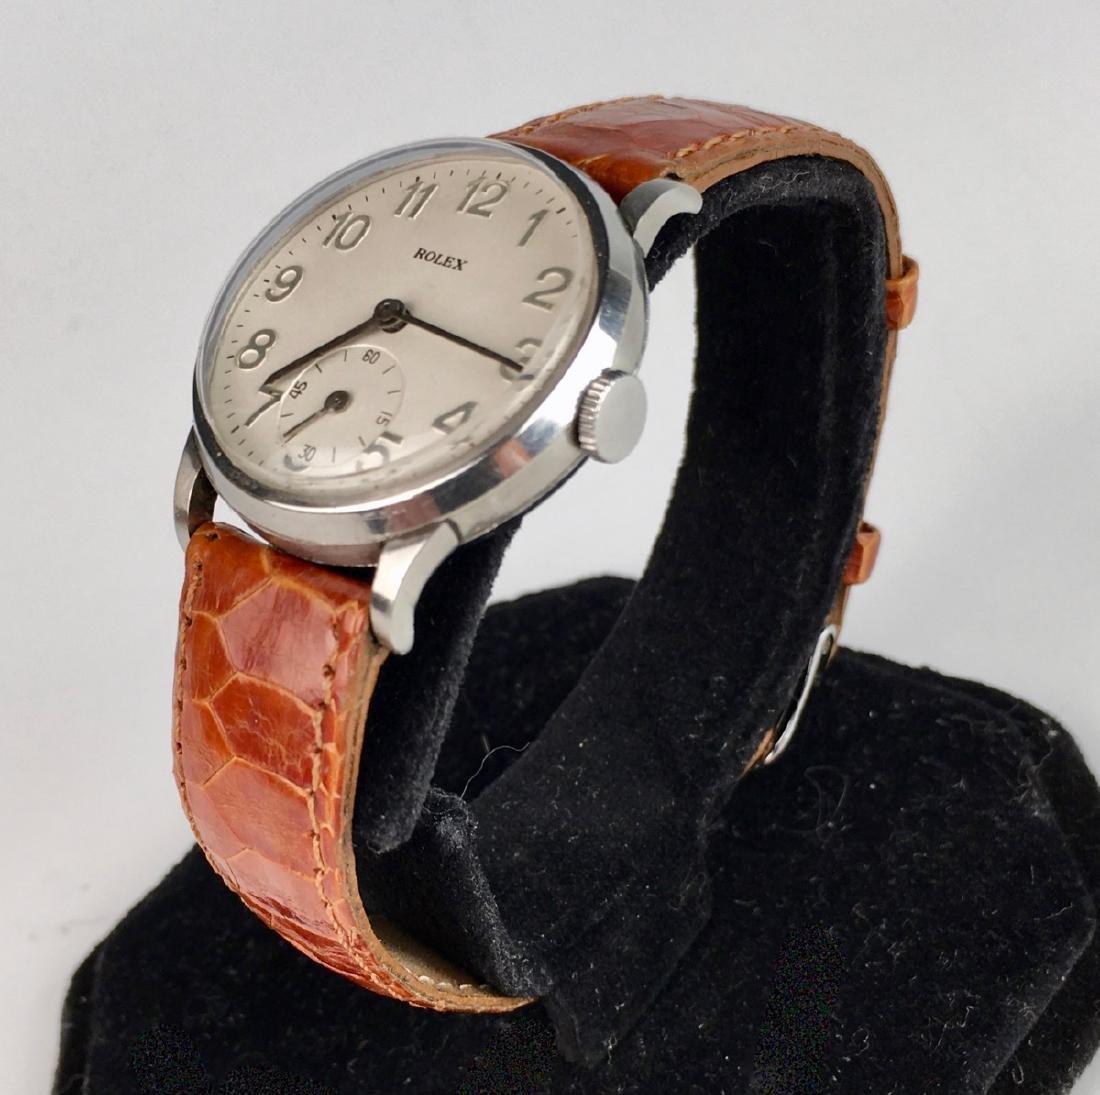 Rolex Stainless Steel 17 Jewels Wrist Watch - 2